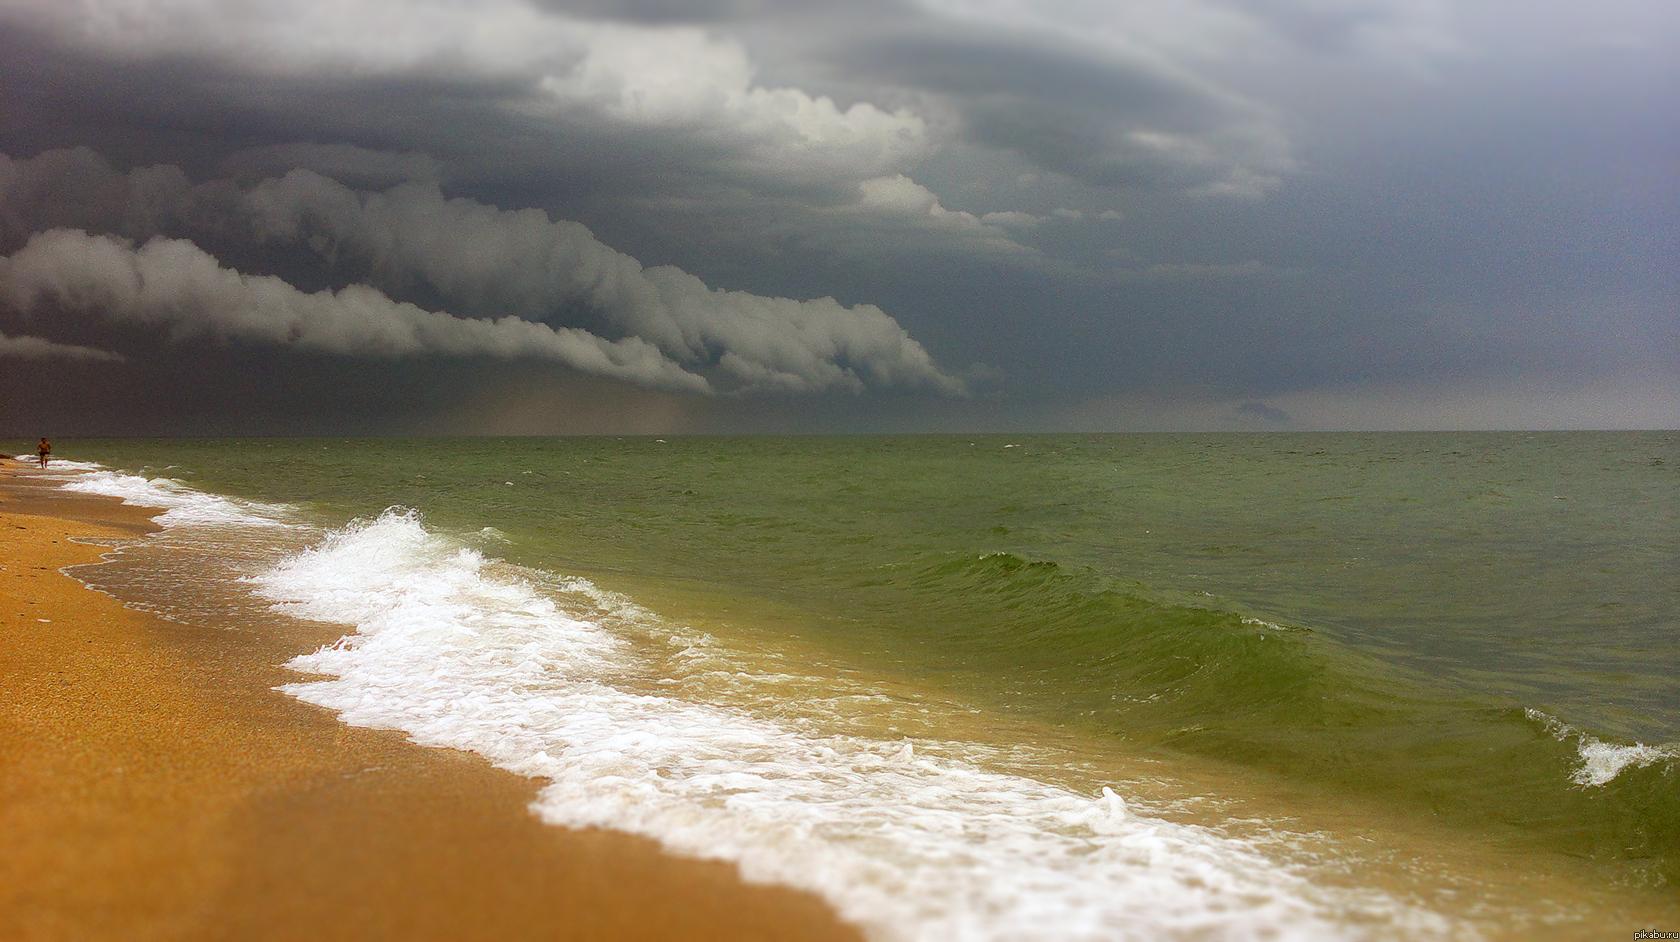 Пляж островок махачкала фото